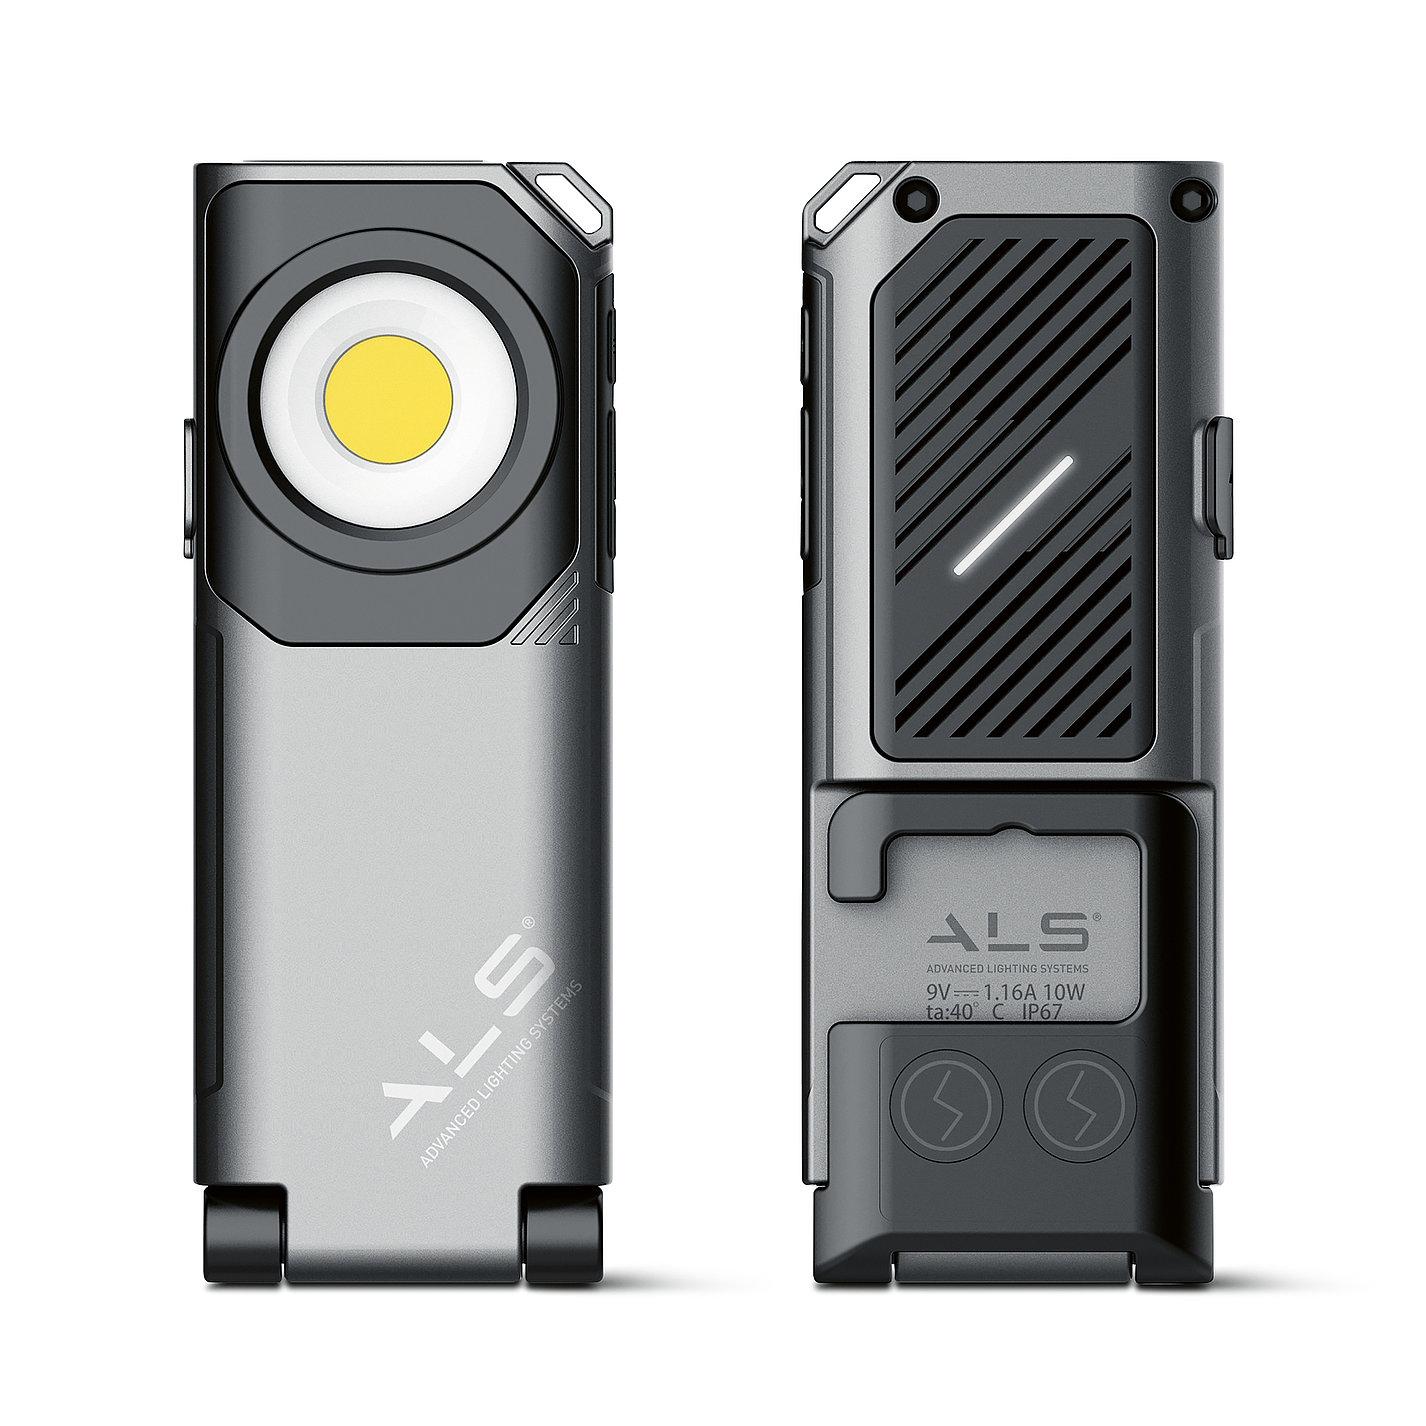 Handheld Work Light | Red Dot Design Award